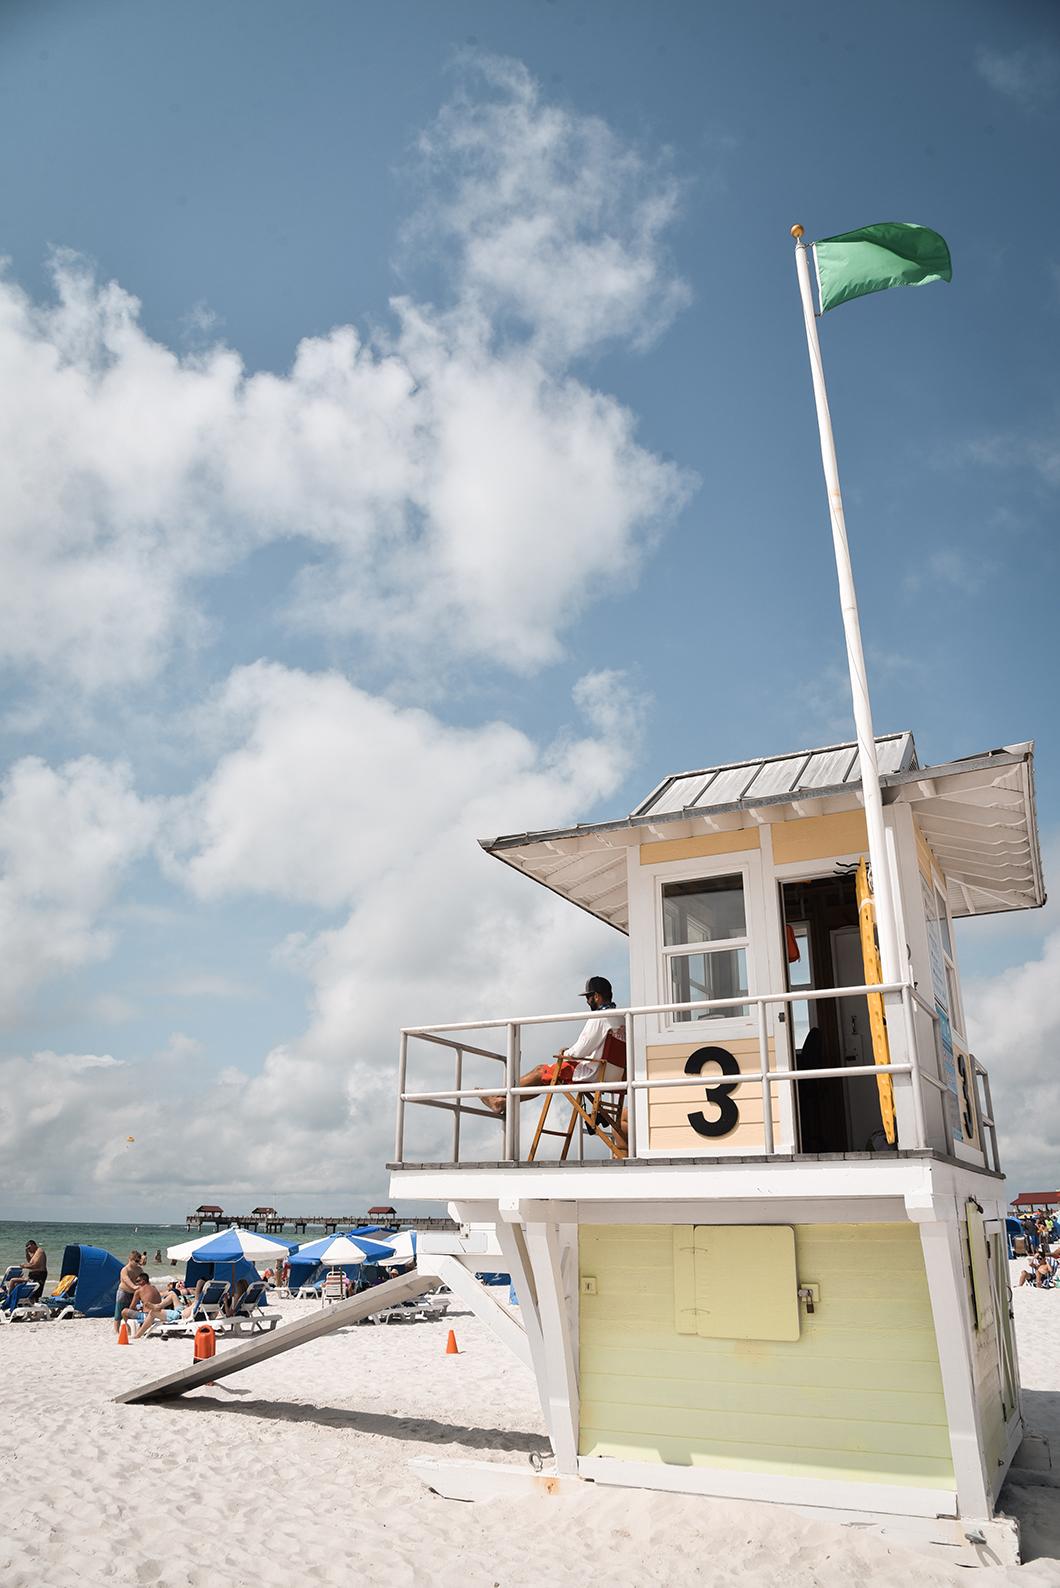 Visiter Clearwater et ses plages